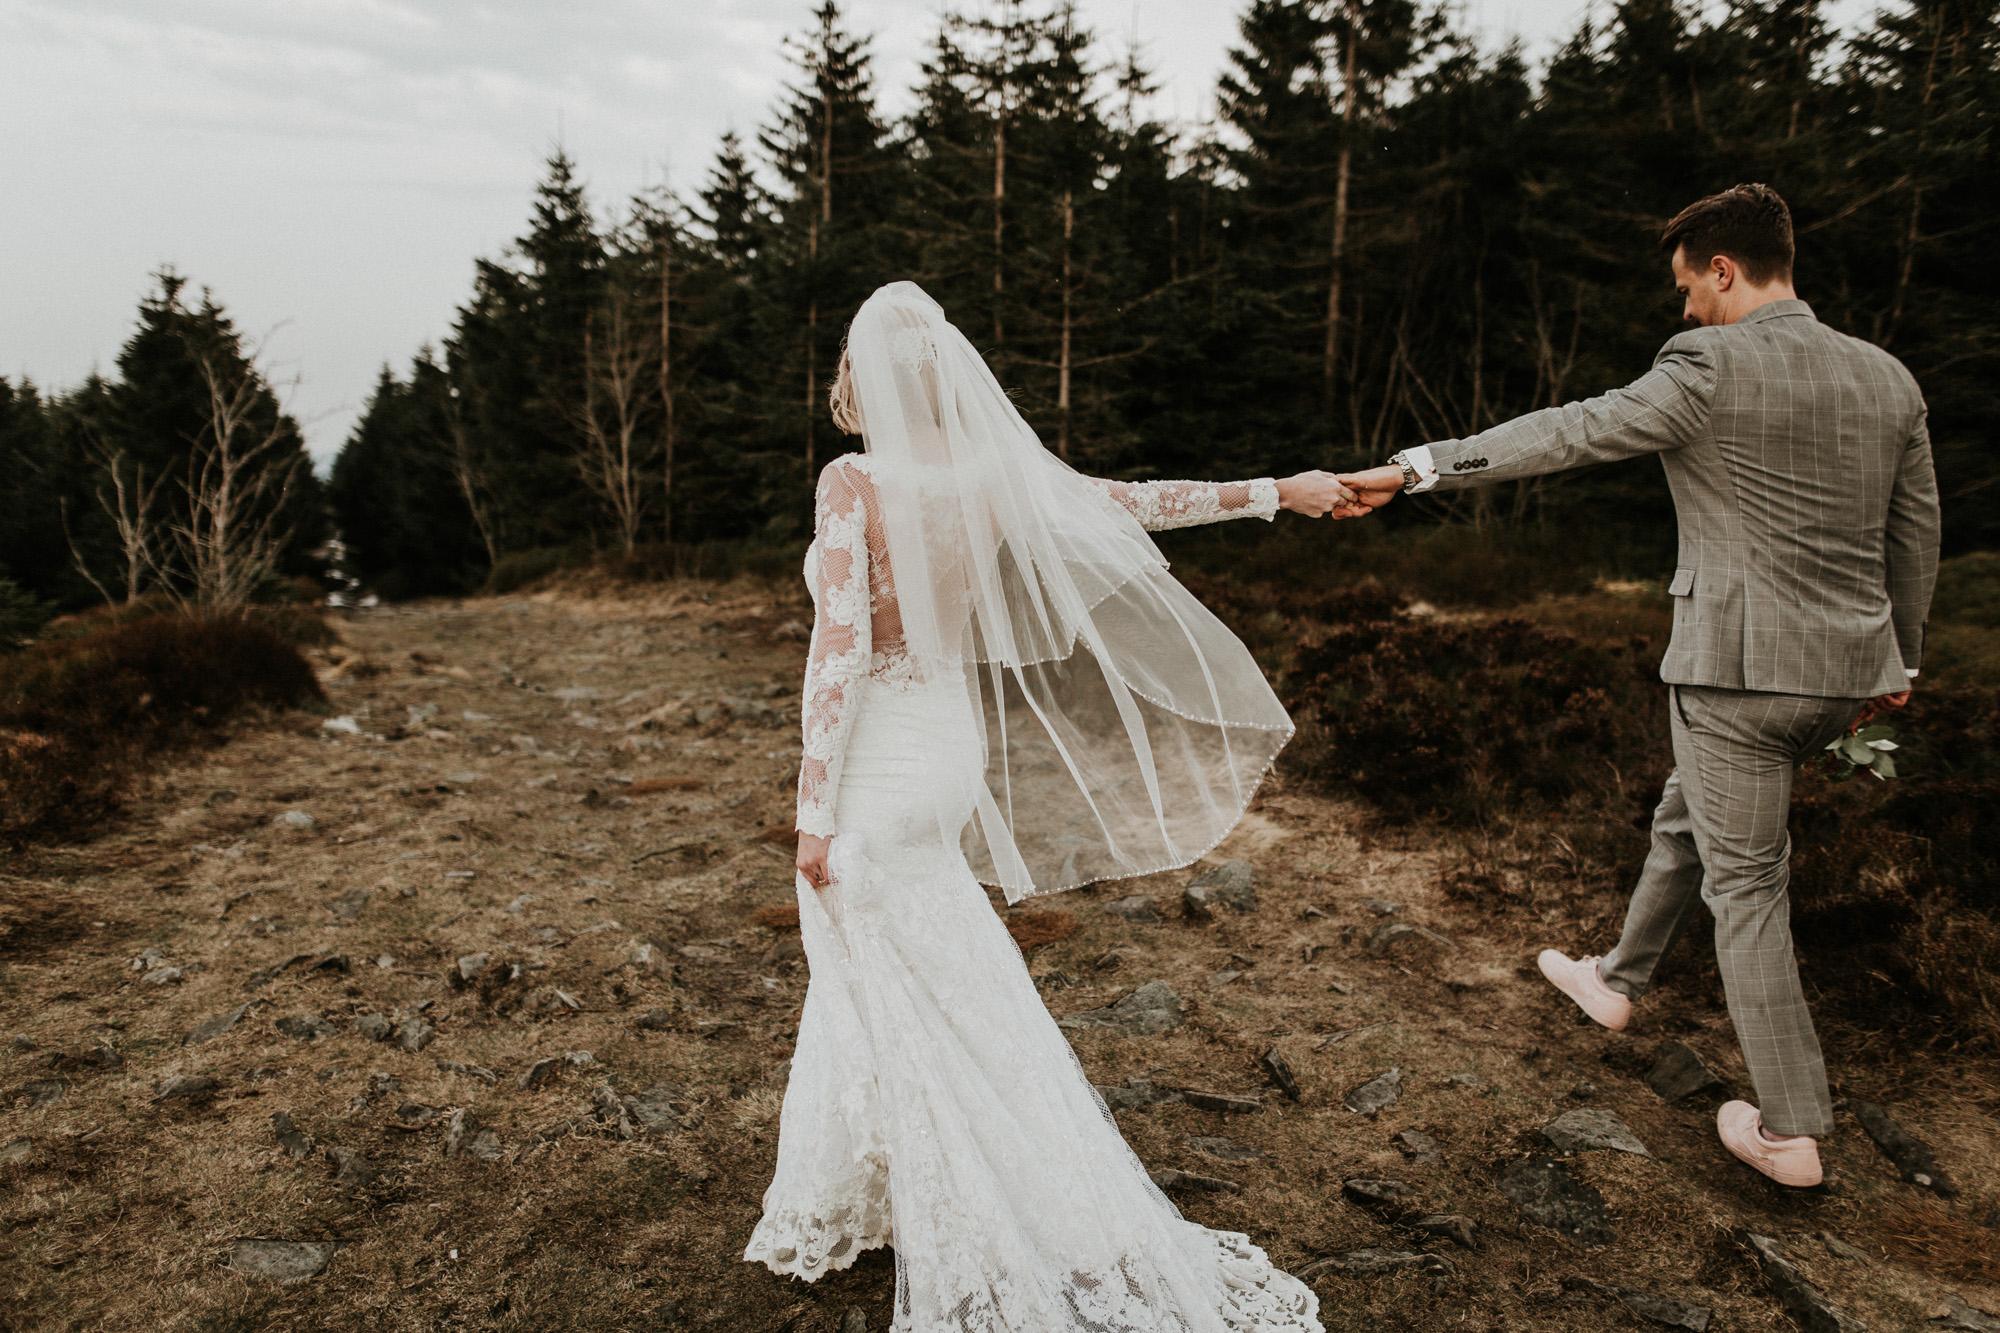 DanielaMarquardtPhotography_Hochzeitsfotograf_Düsseldorf_Köln_Mallorca_Bayern_Austria_Harz_LinaundMaik_Afterwedding-Shooting_Weddingphotographer_Ibiza_Tuskany_Italien_Toskana62